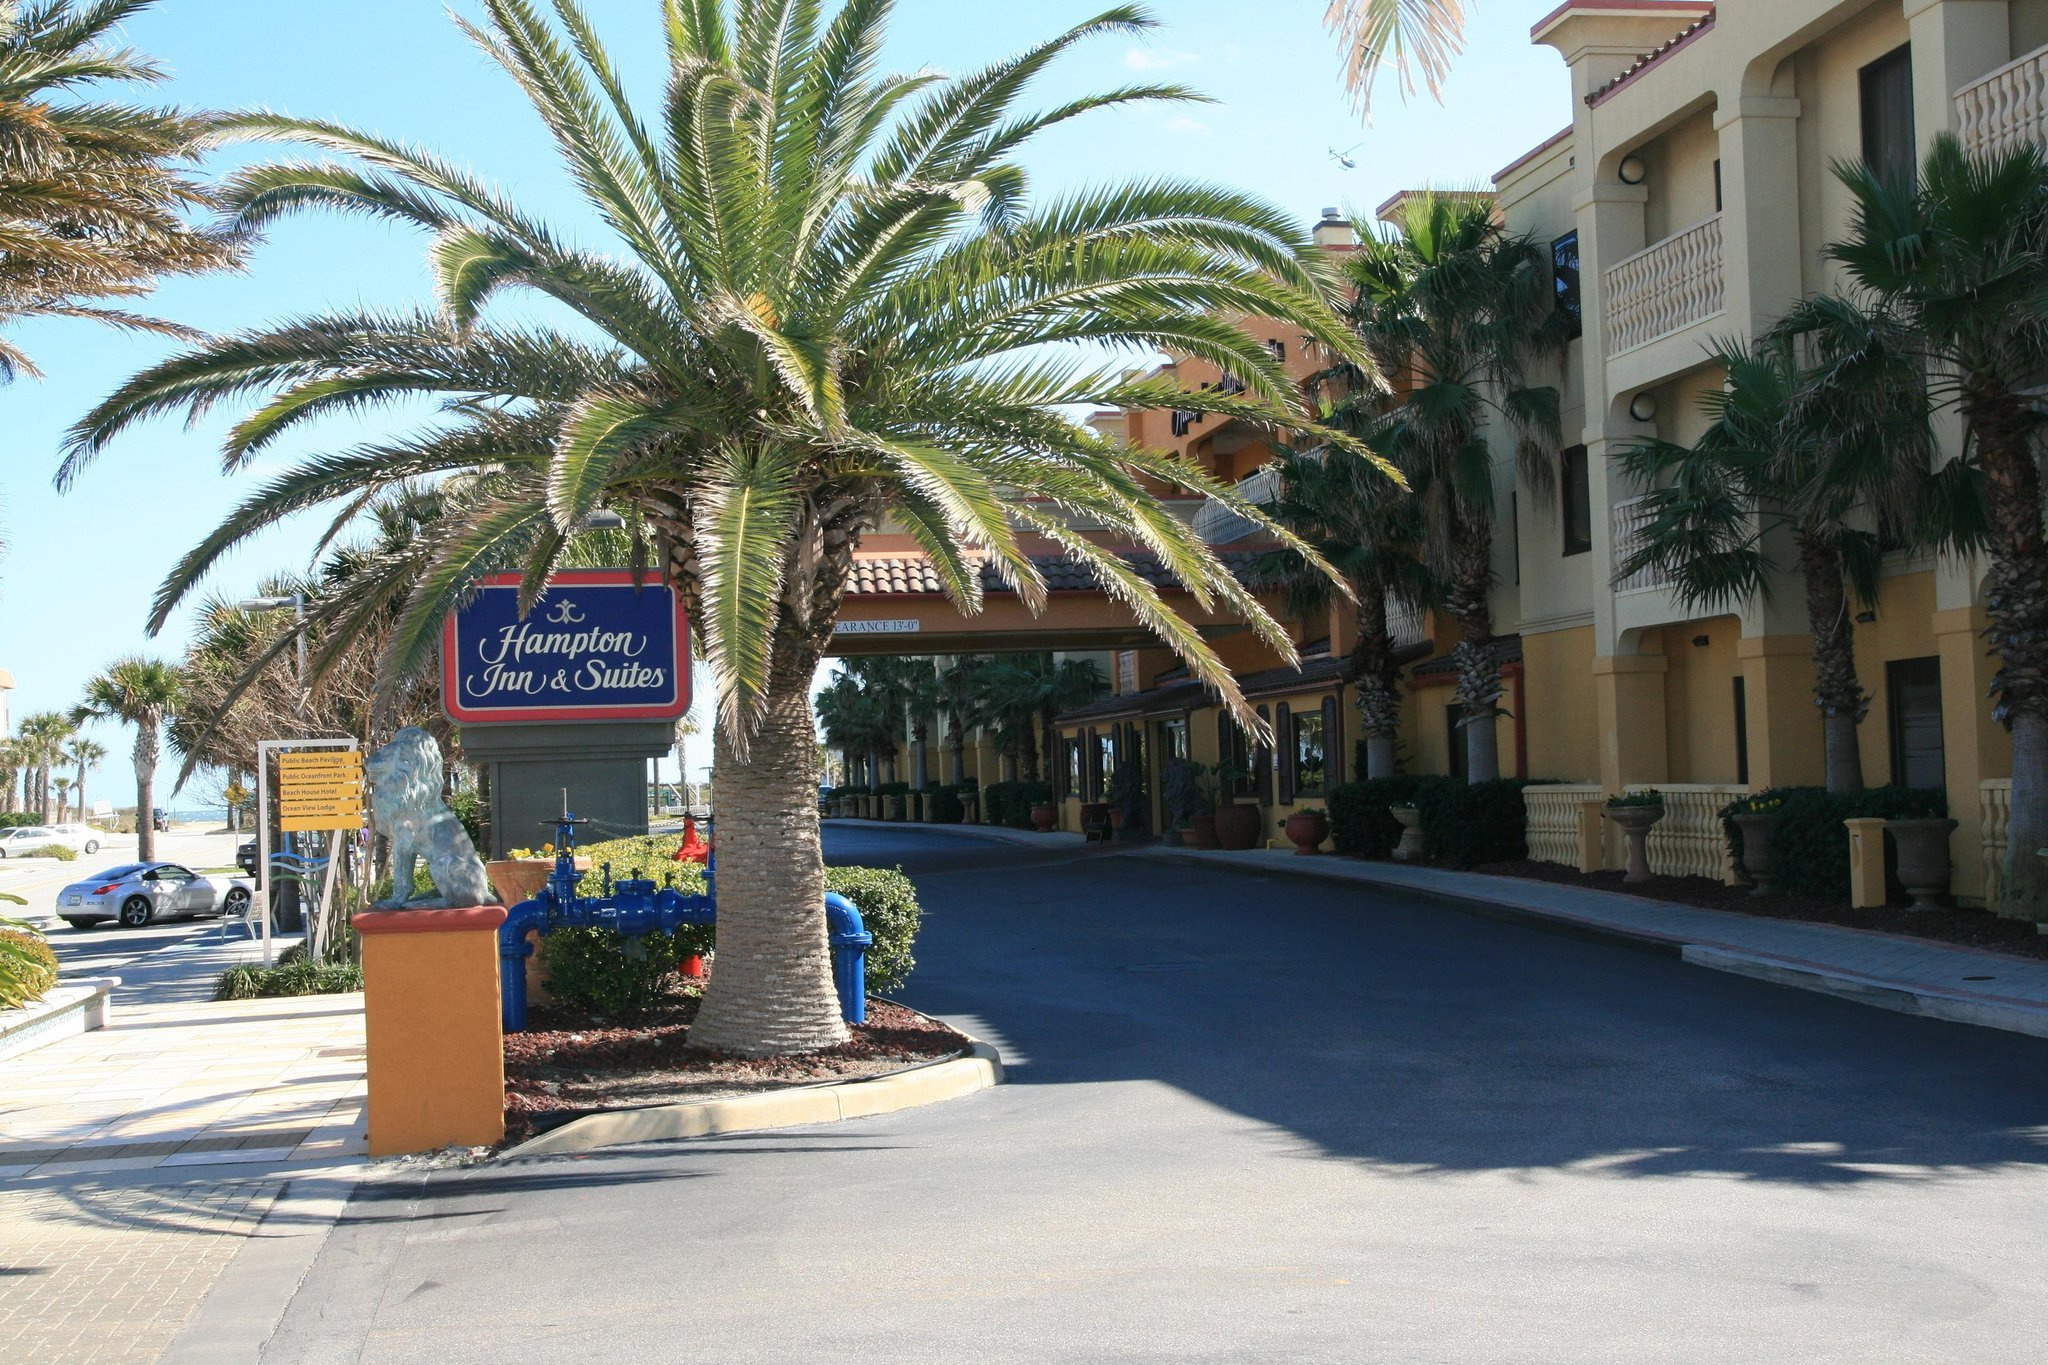 Hampton Inn & Suites St. Augustine - Vilano Beach